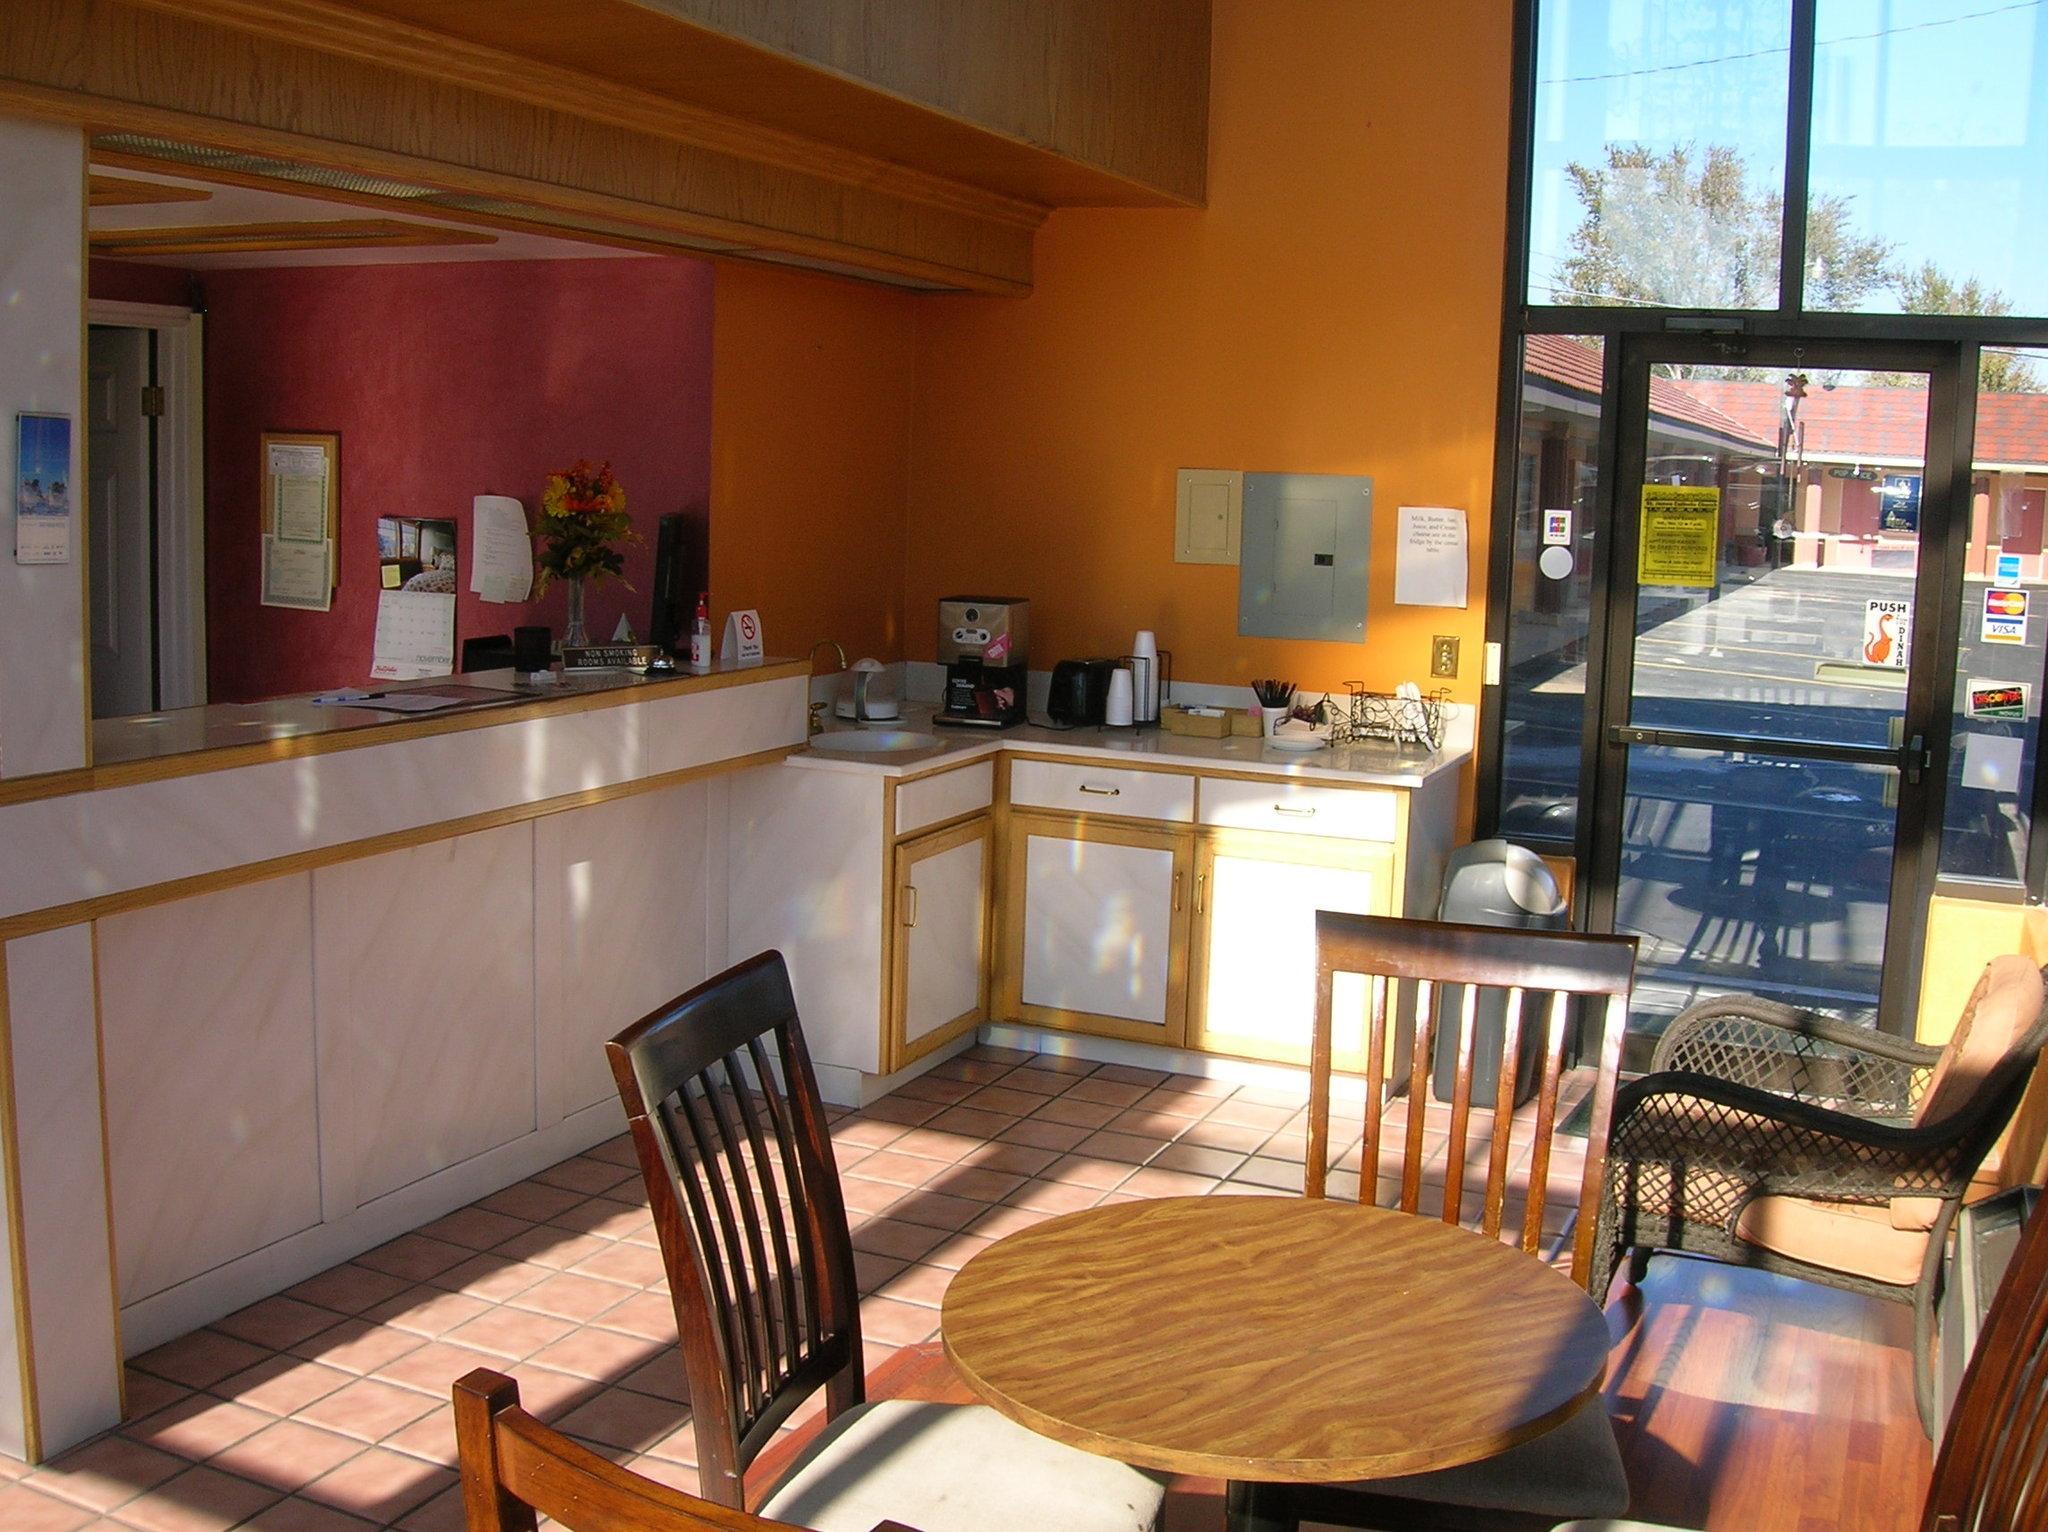 Gallery image of Days Inn Vernal